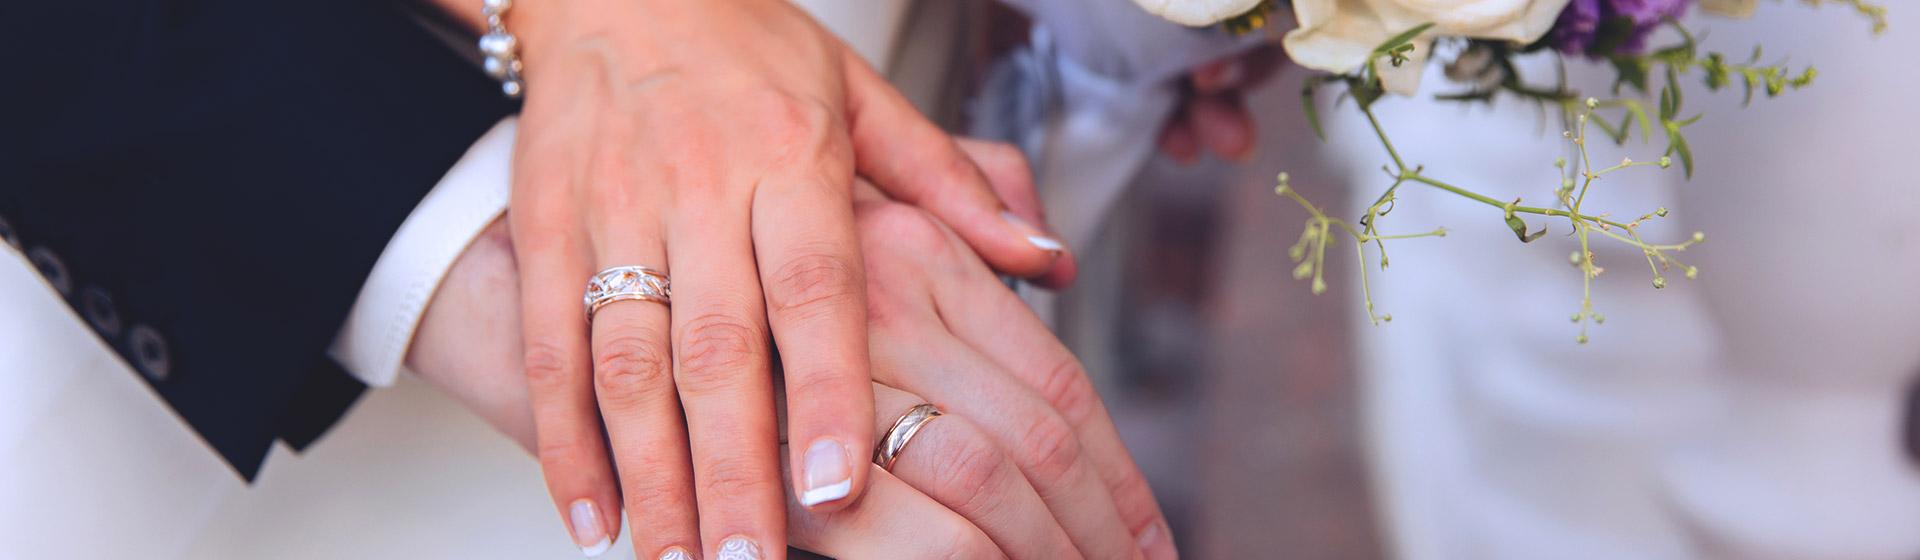 Plan Your Wedding at Wabash, Indiana